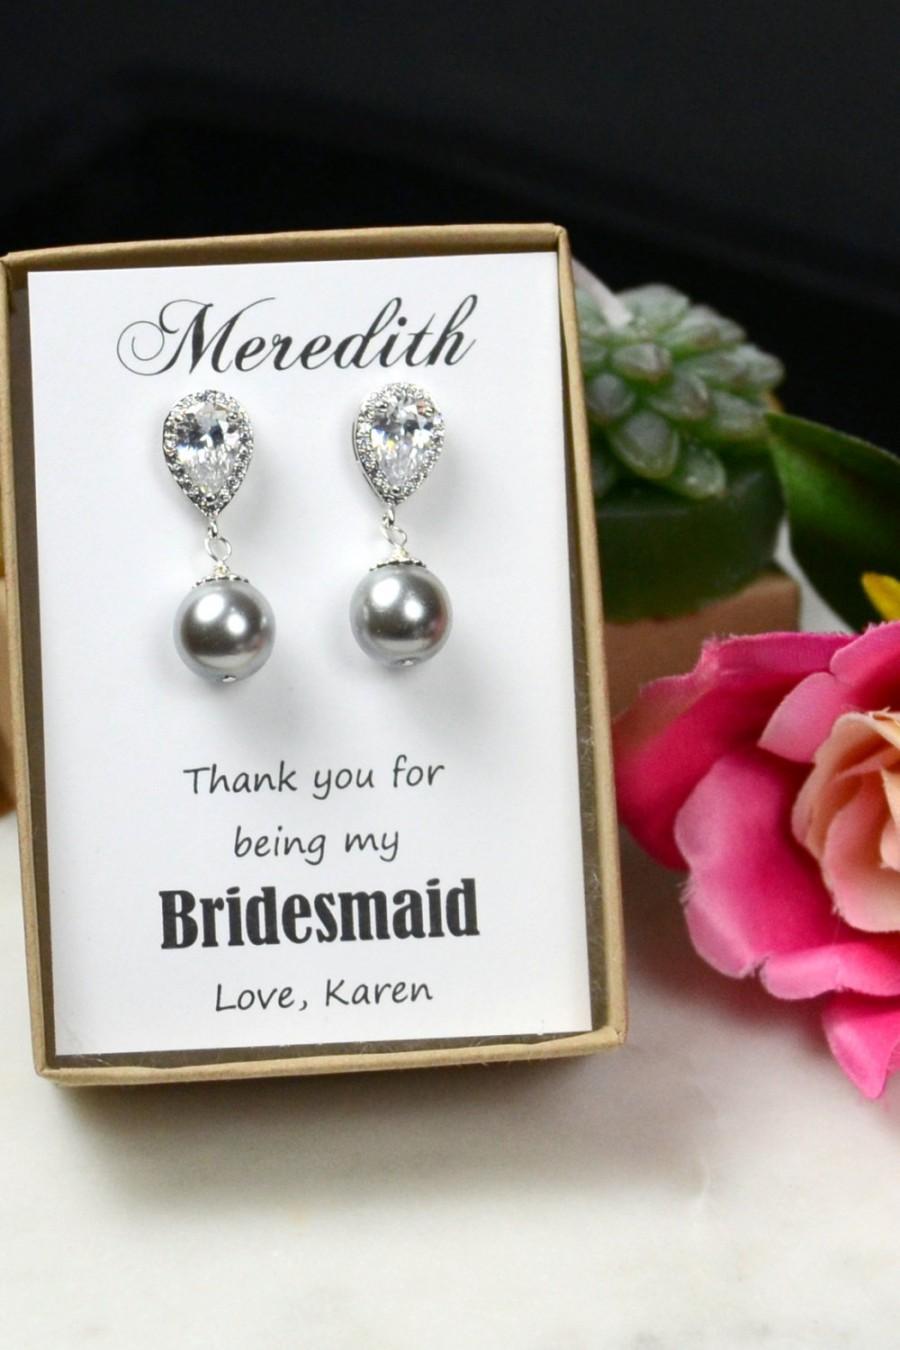 Wedding - Wedding Jewelry Bridesmaid Gift Bridesmaid Jewelry Bridal Jewelry Swarovski Round Pearl Drop Earrings Cubic Zirconia .Silver gray wedding